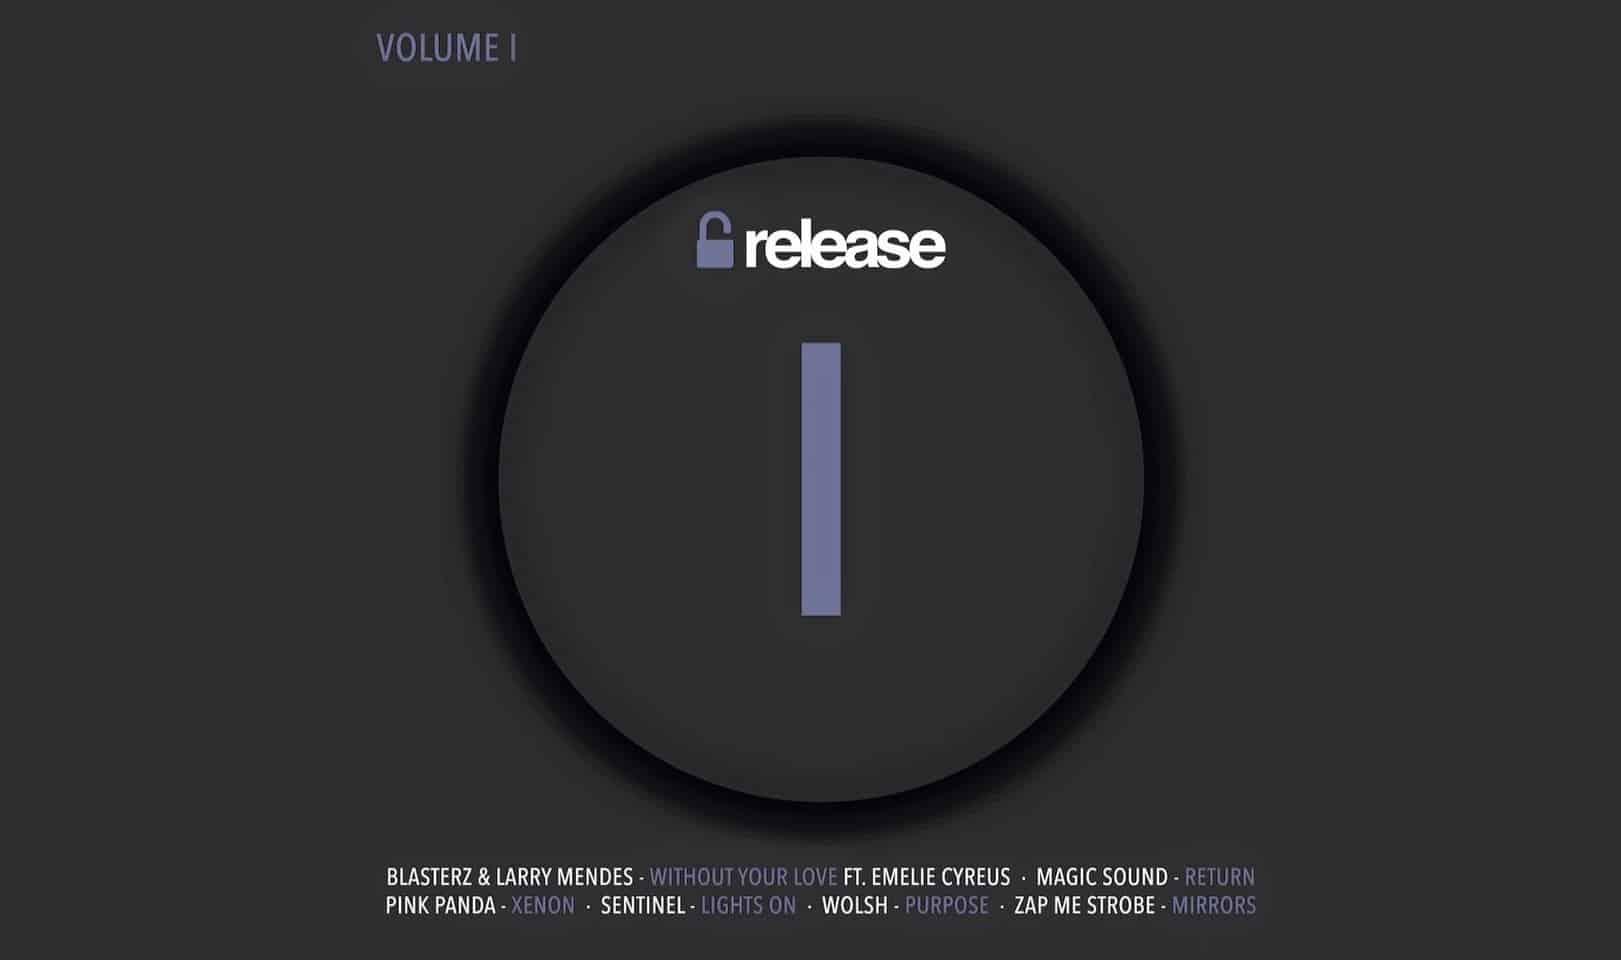 release volume1